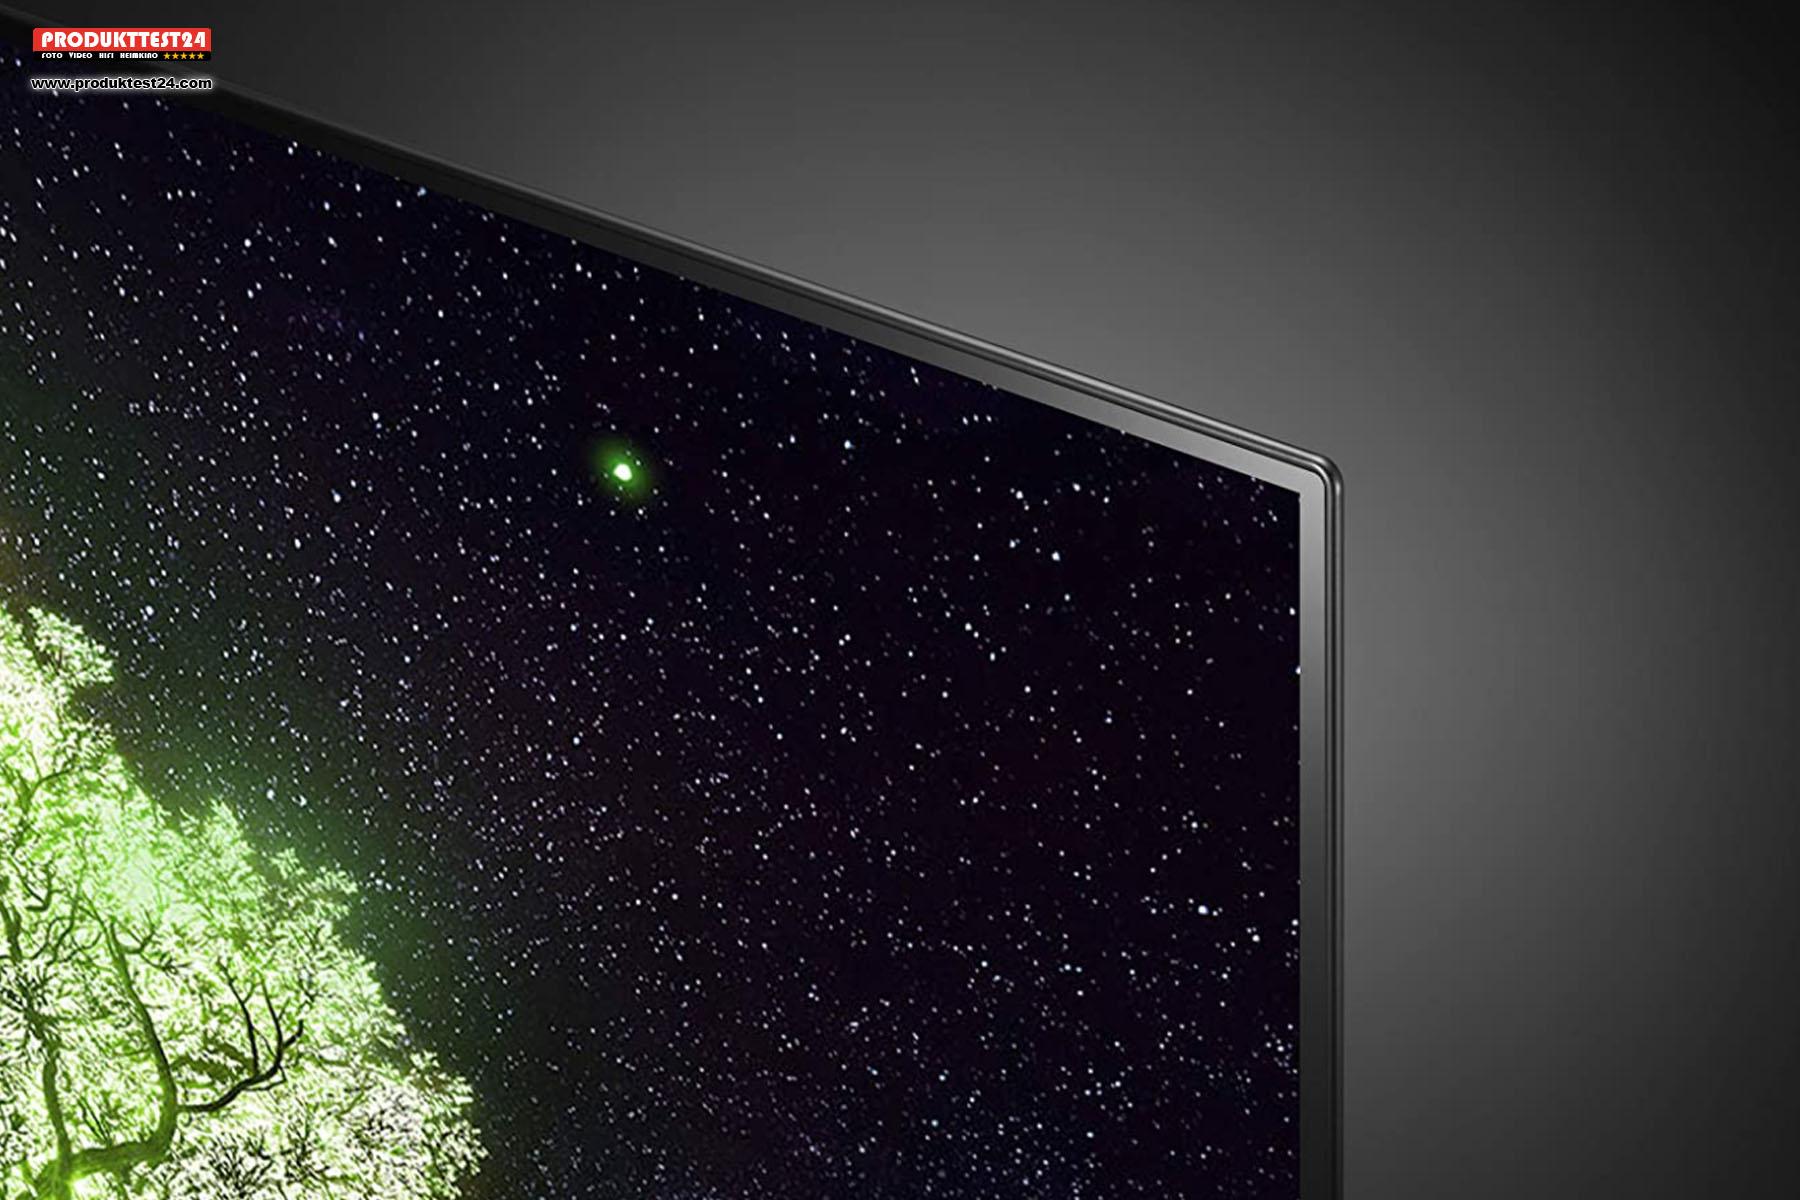 Extrem dünn - Der LG OLED65A19LA sieht schick aus